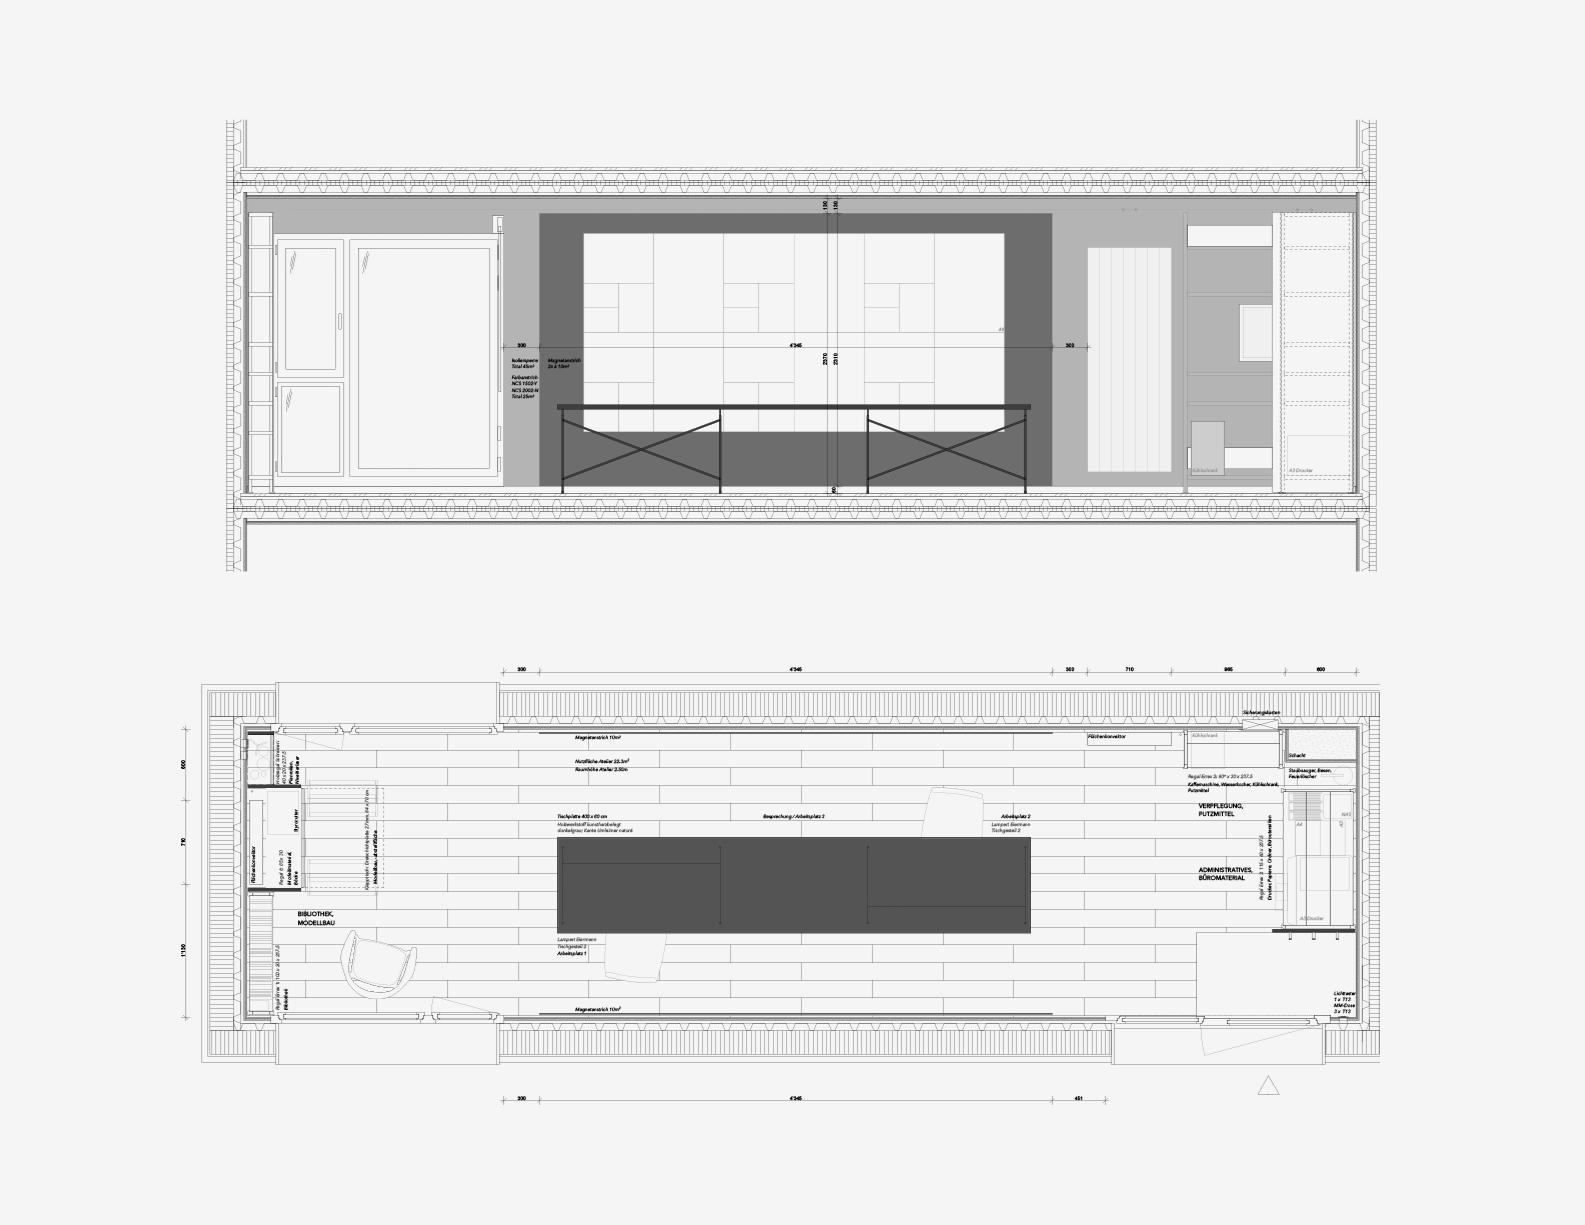 Atelier Geerenweg › 1_20 Grundriss